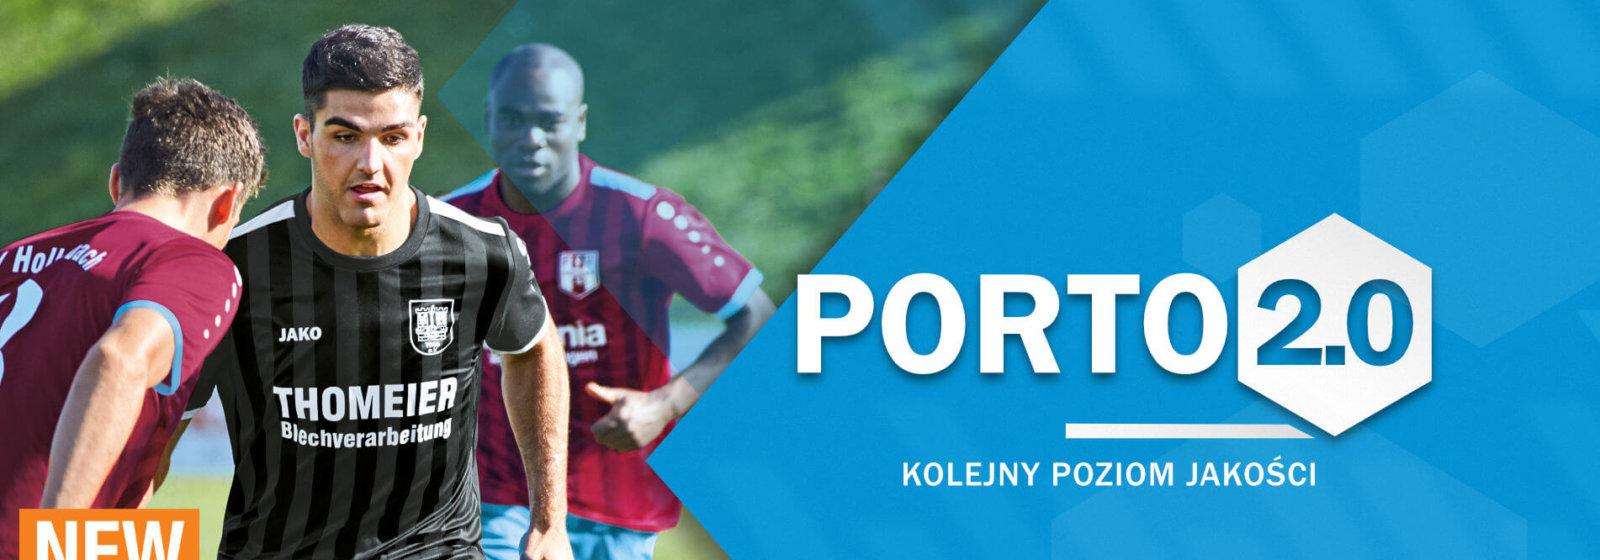 baner-Porto 2.0